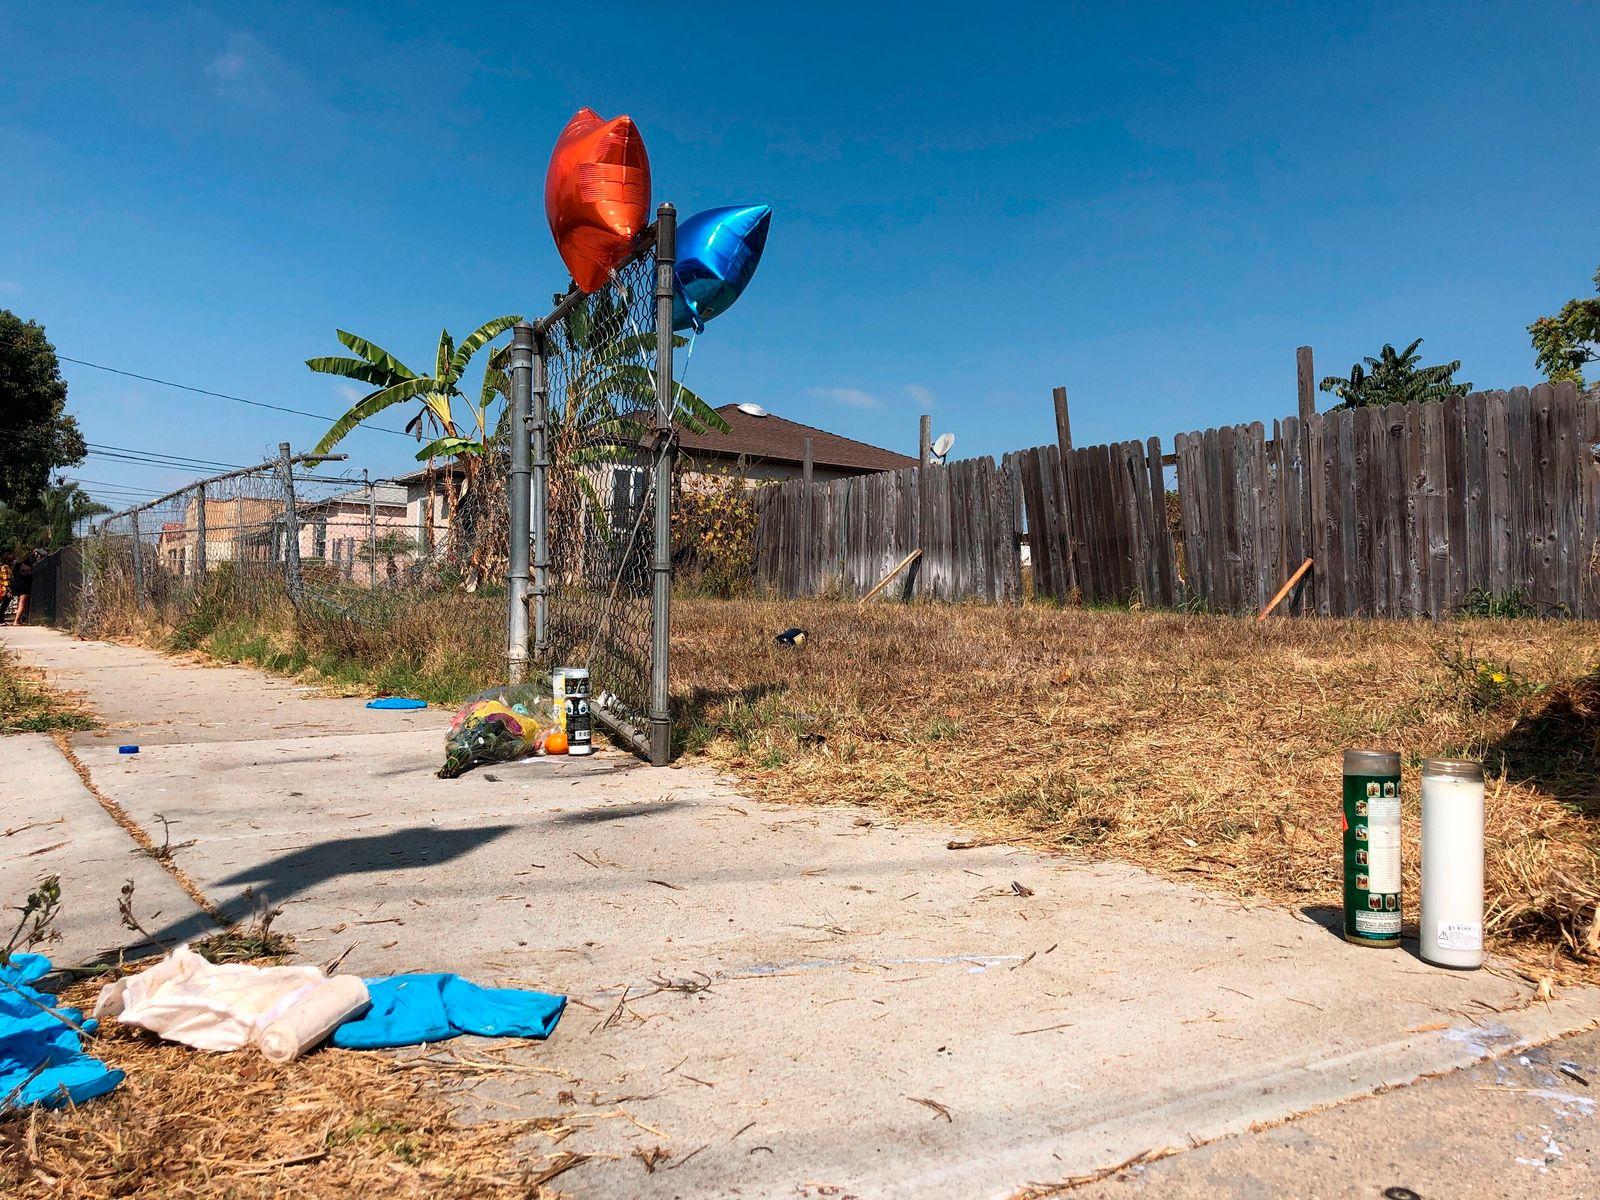 Sheriff's Deputy Shooting-Suspect Killed